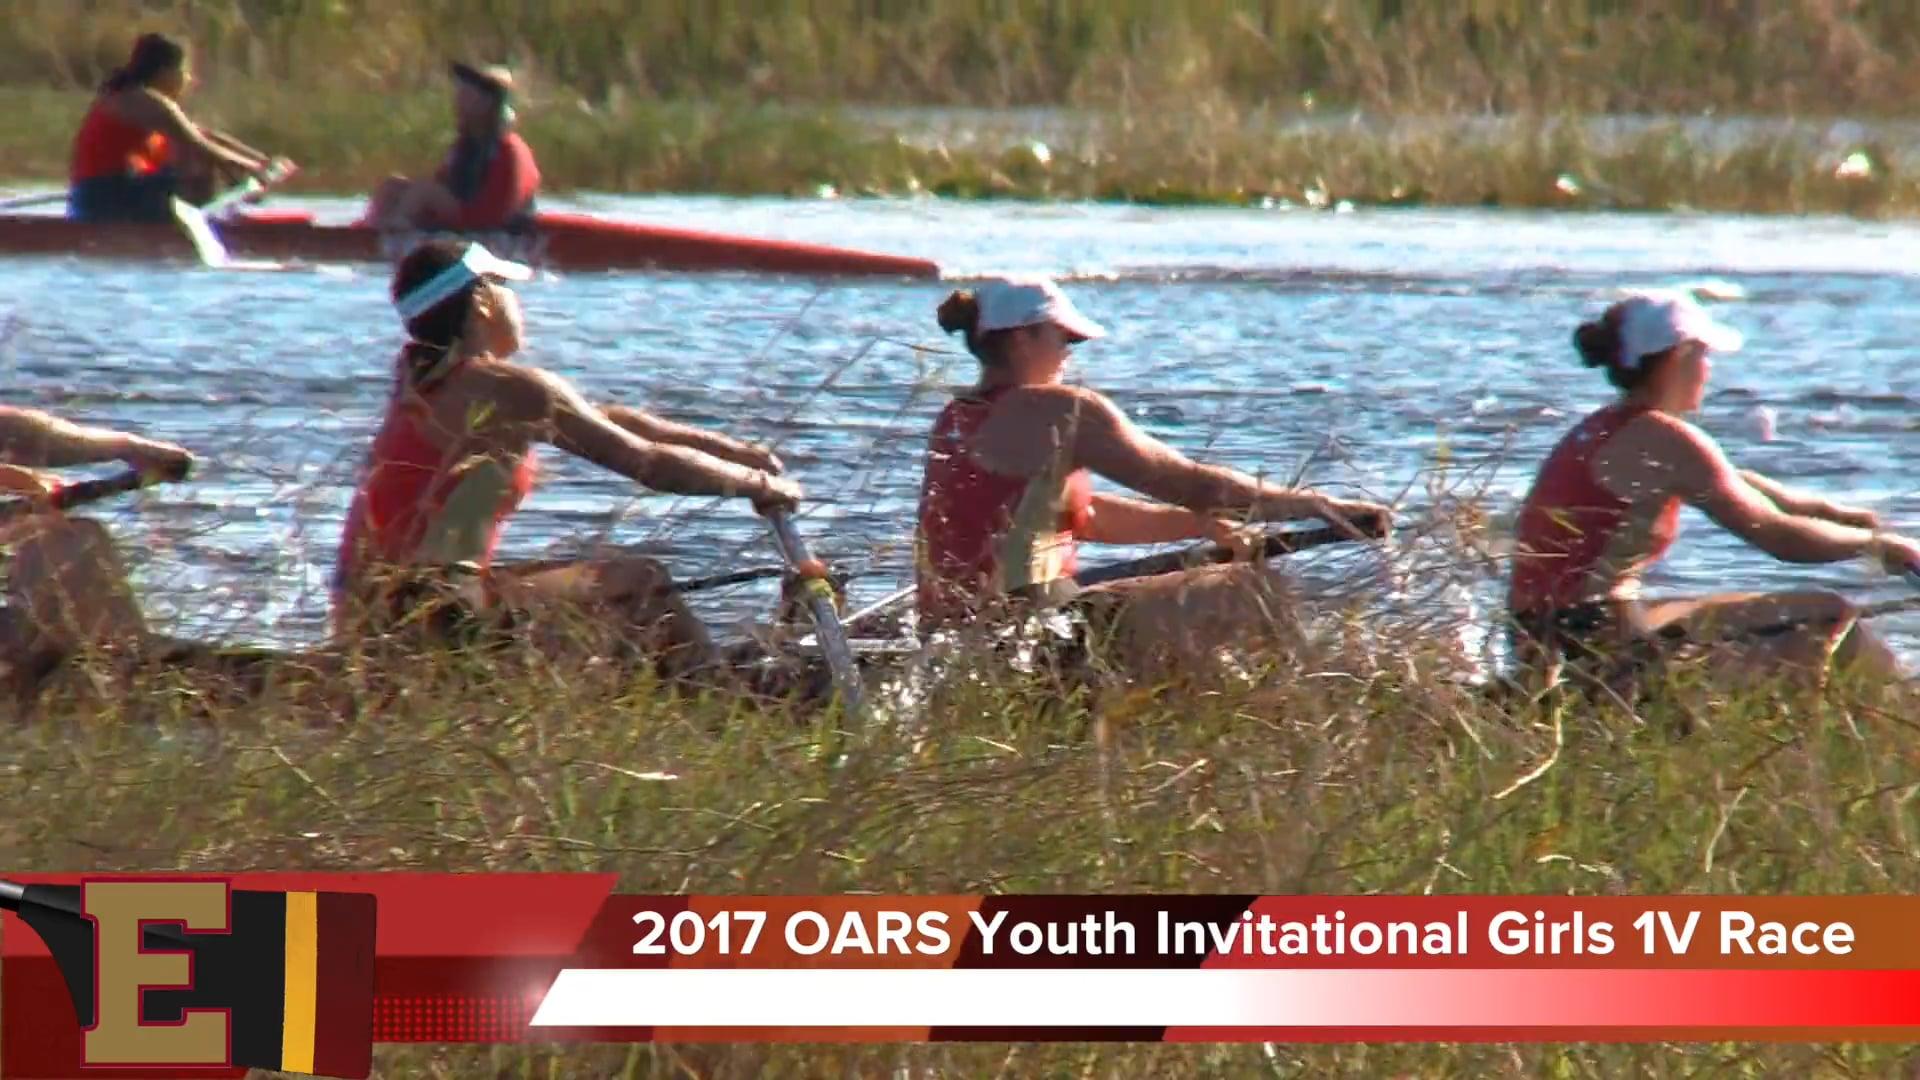 Girls 1V8+ Race 2017 OARS Youth Invitational